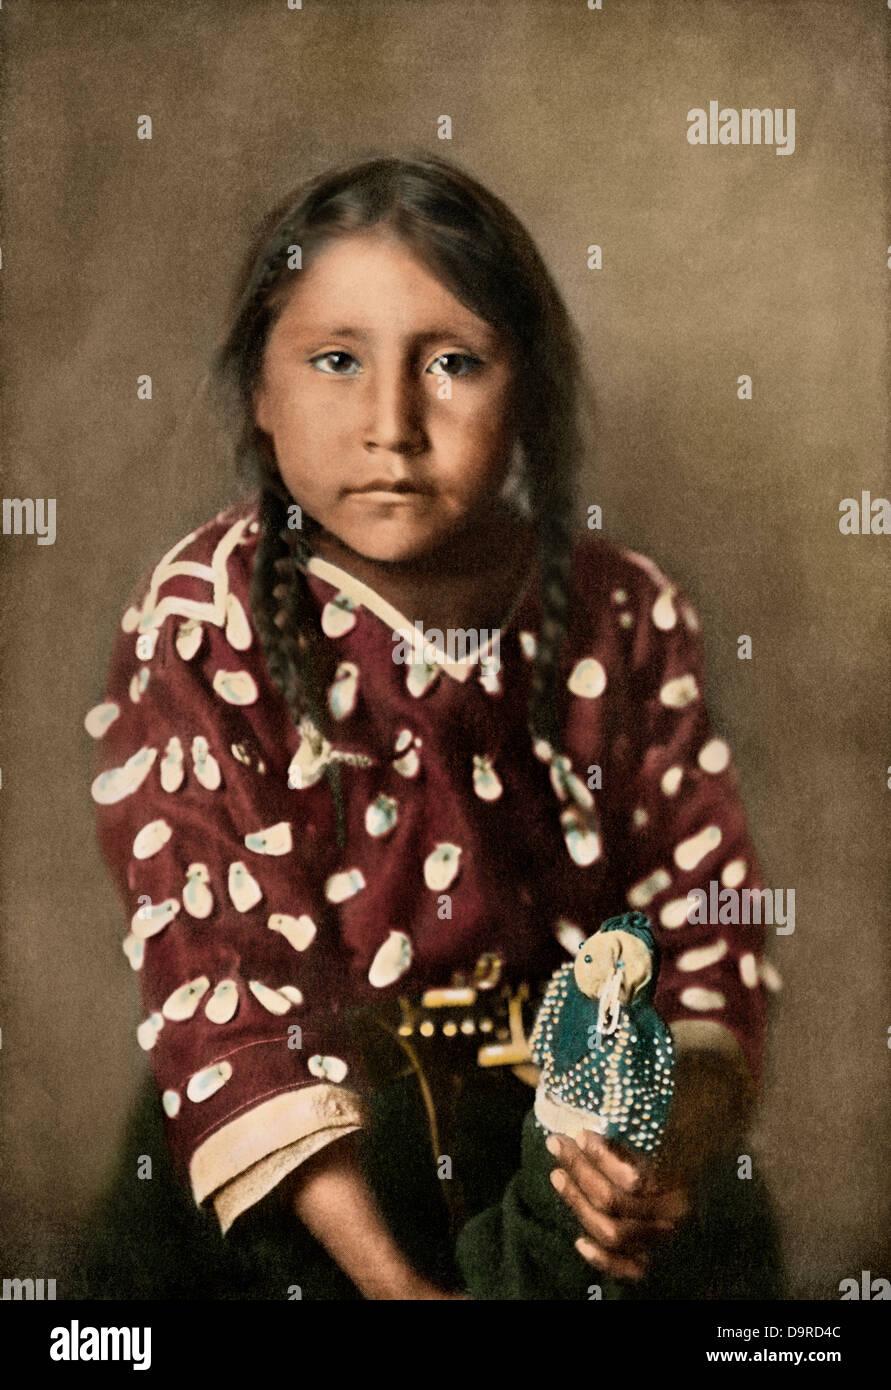 Crow Indian girl Glydis Littlenest o corse-a-Sorrel-Horse, circa 1900. Colorate a mano i mezzitoni di una fotografia Immagini Stock